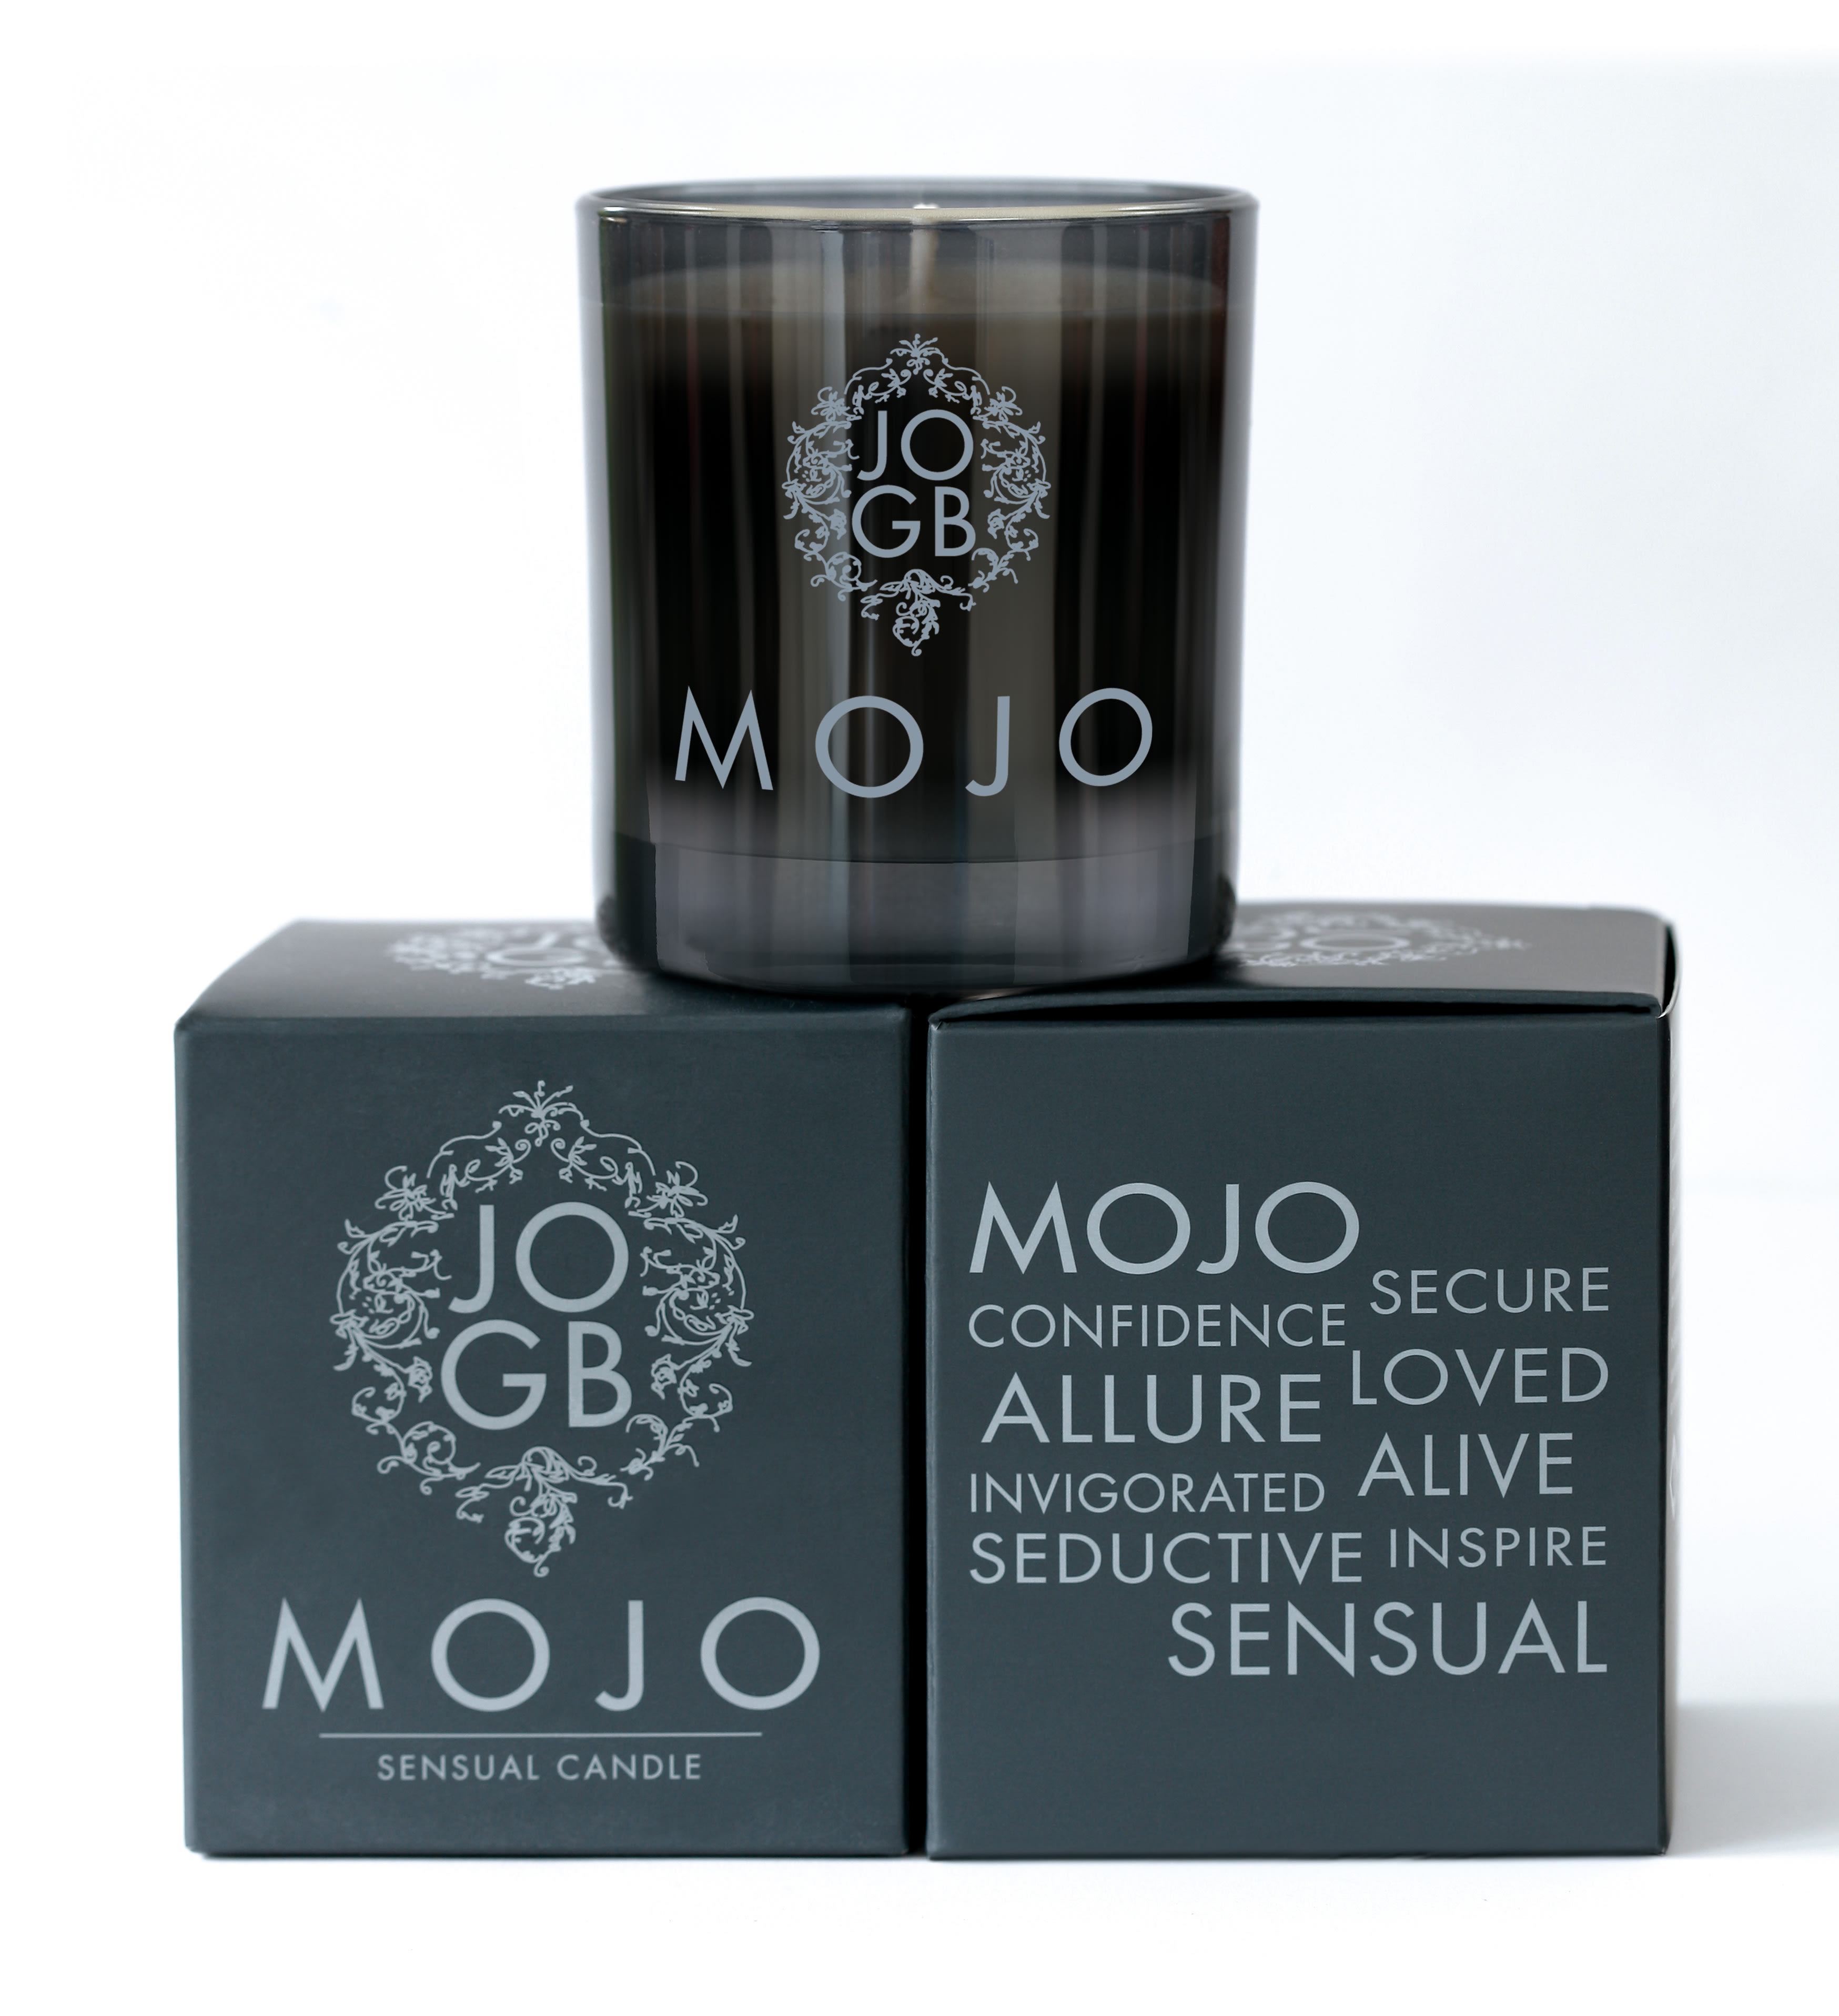 JOGB Ltd JOGB MOJO Scented candle